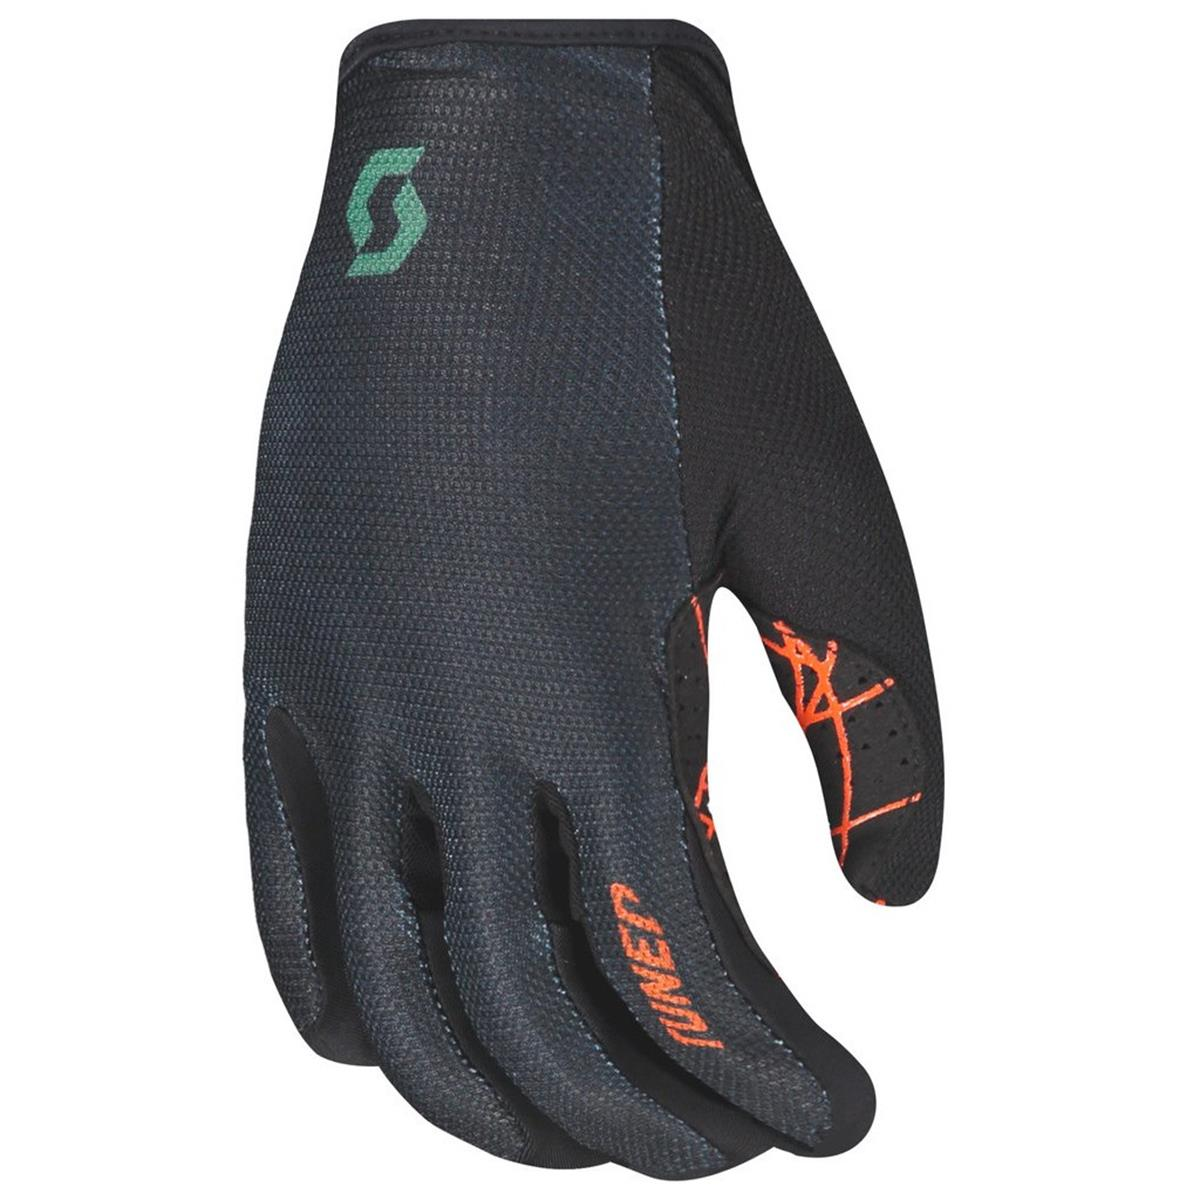 Scott Bike-Handschuhe Traction Tangerine Orange/Dark Ivy Green